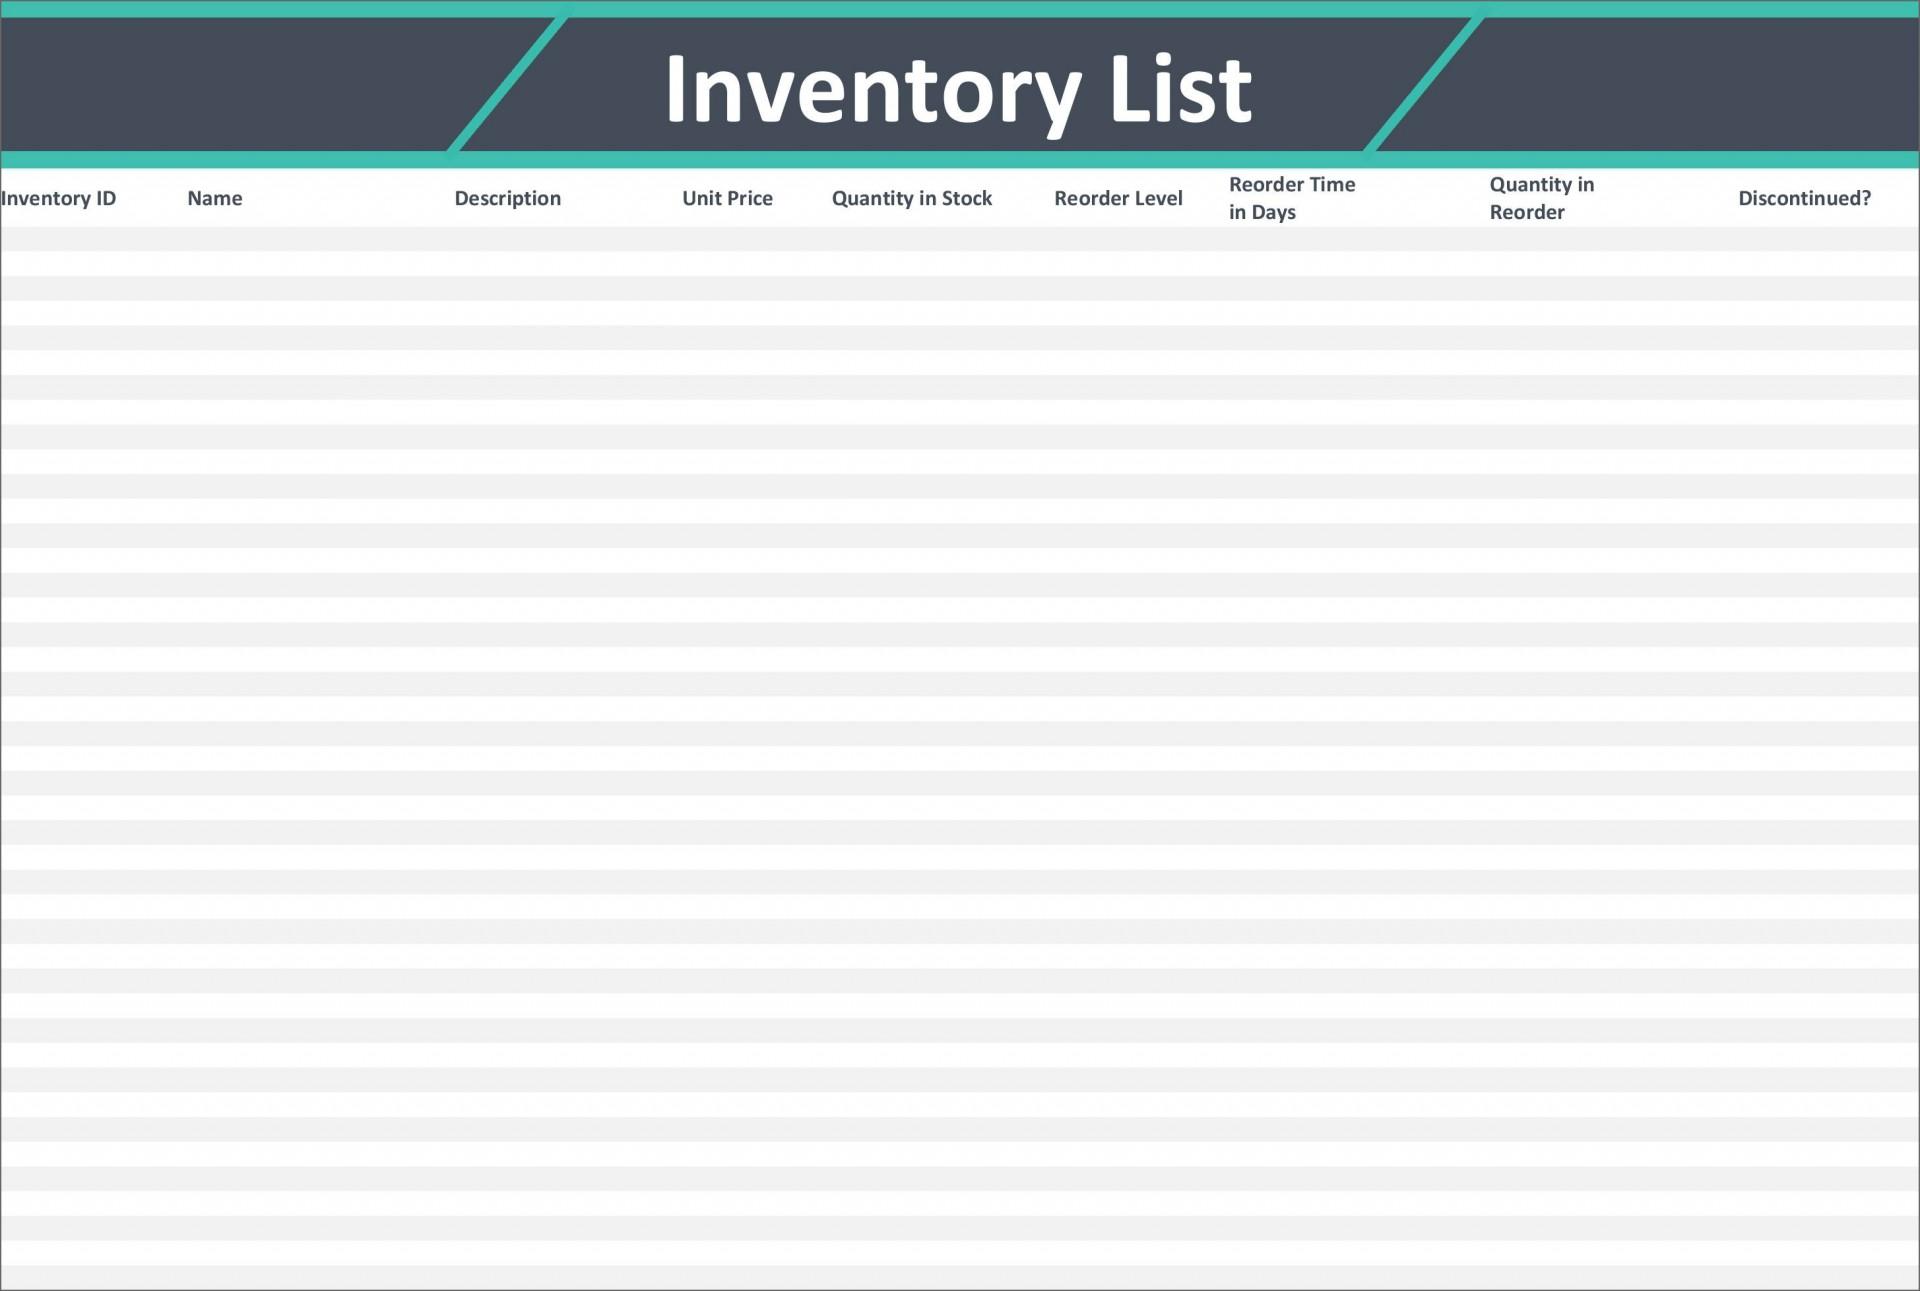 008 Astounding Free Stock Inventory Spreadsheet Template Design 1920